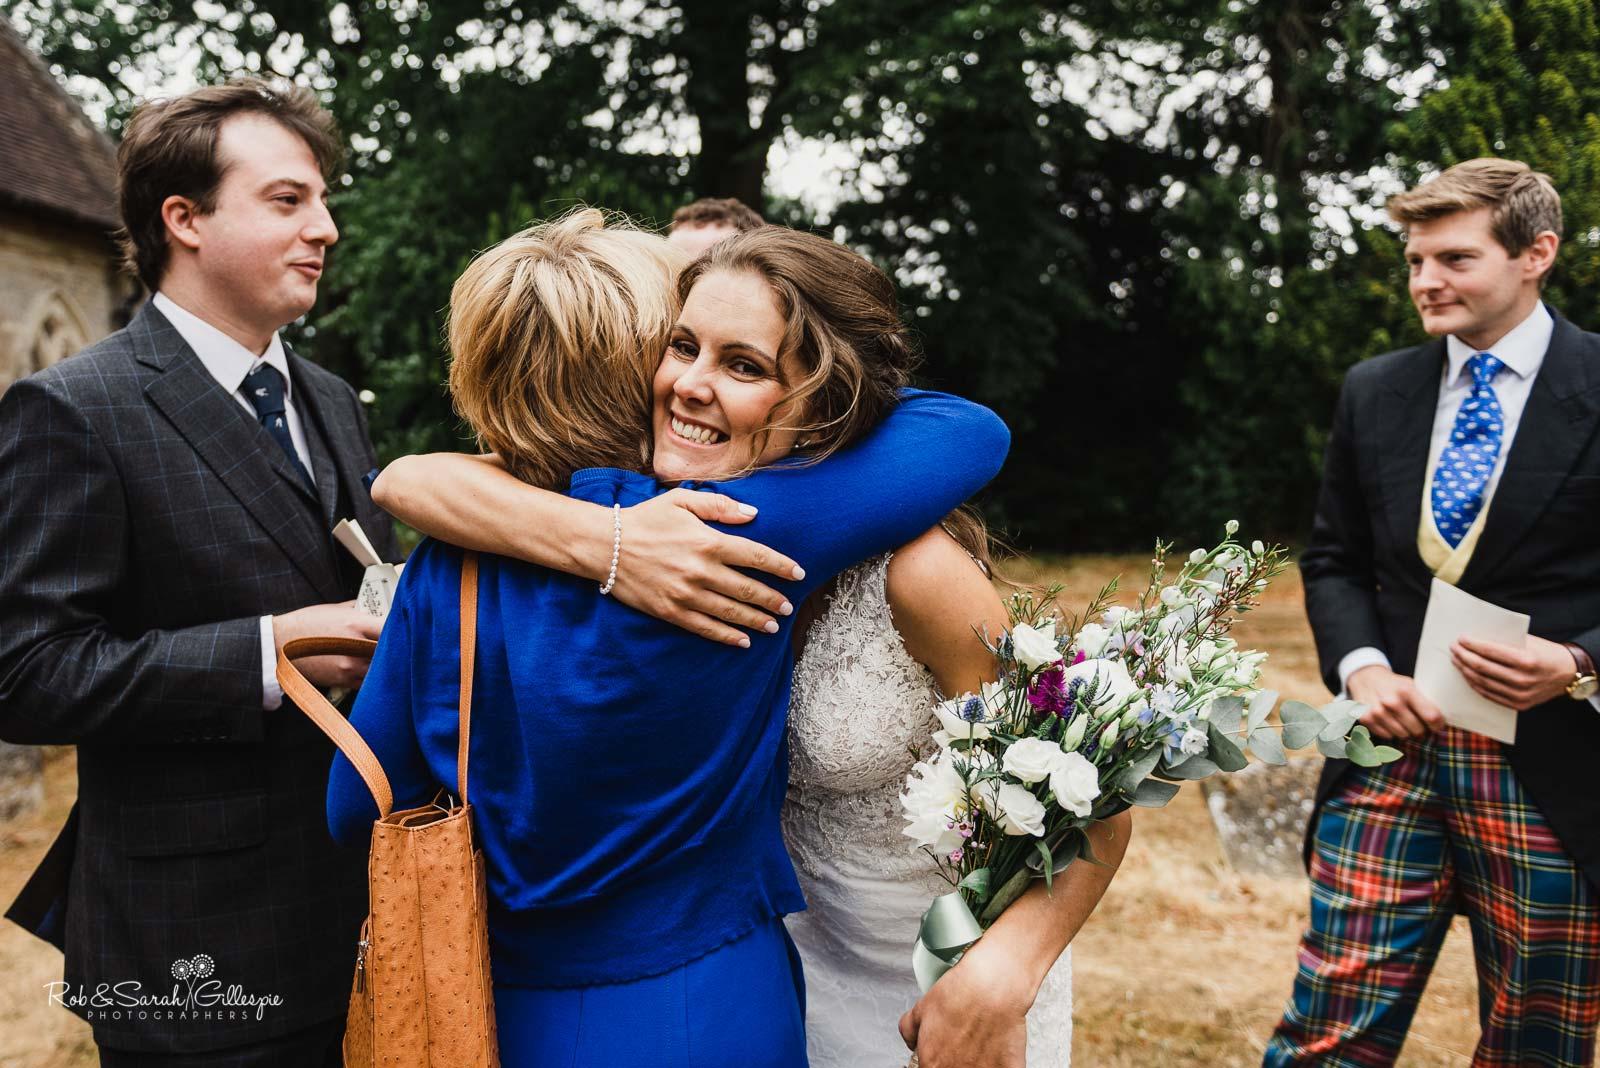 Bride hugs wedding guests at St Giles church Packwood